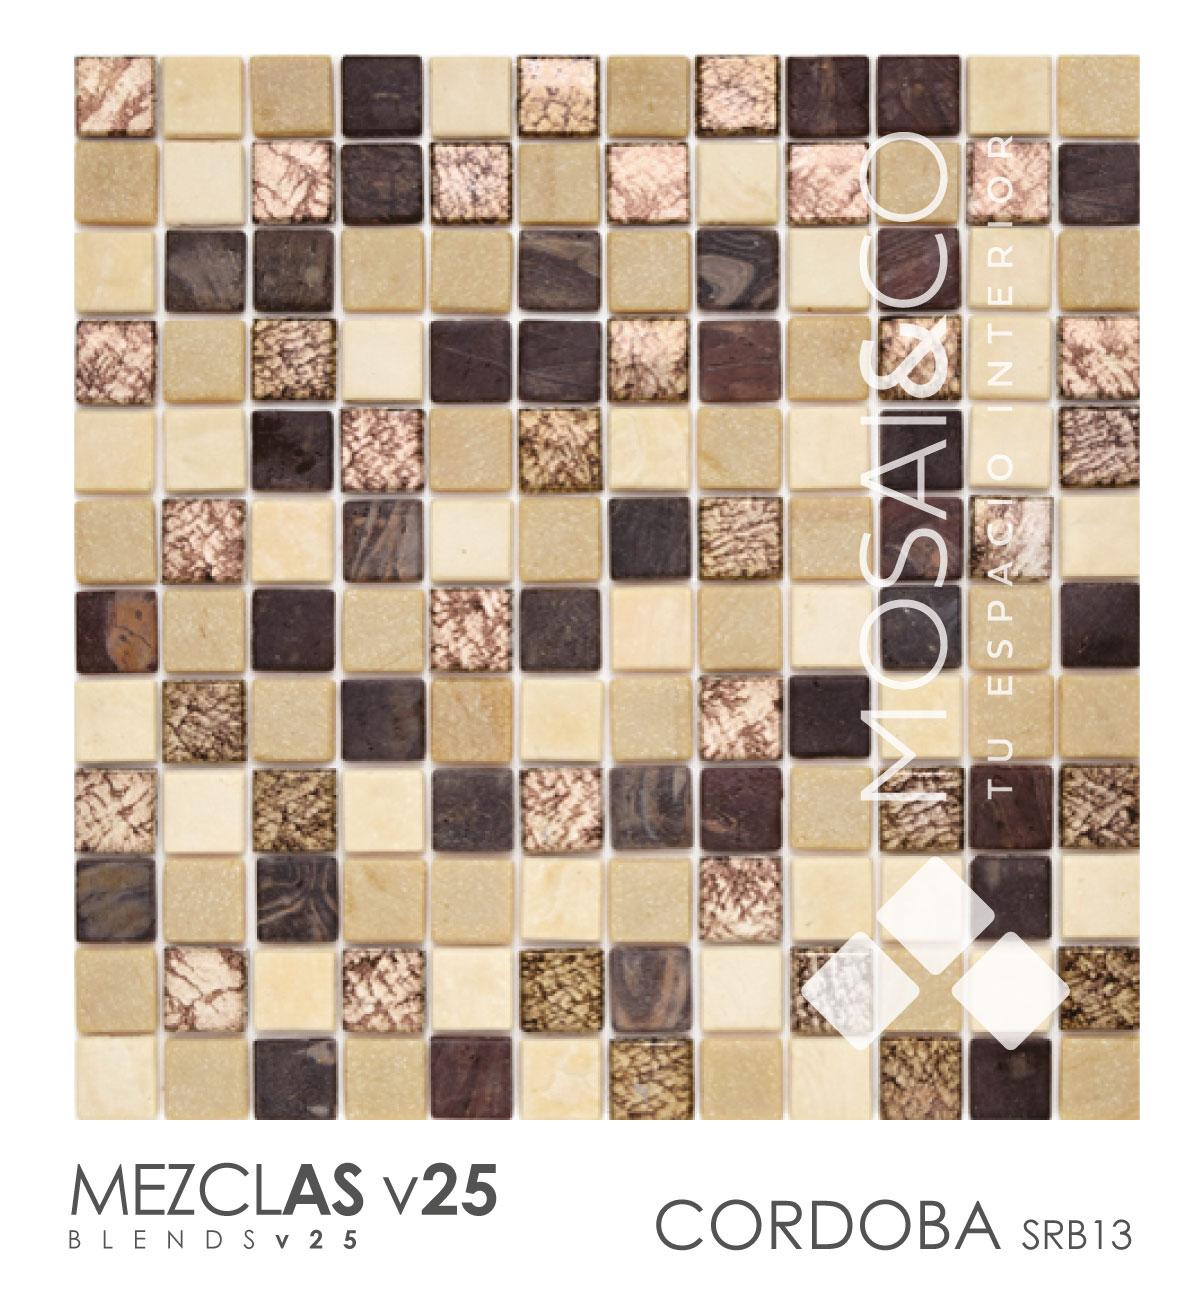 Mezclas-v25-MosaiCo-CORDOBA-SRB13